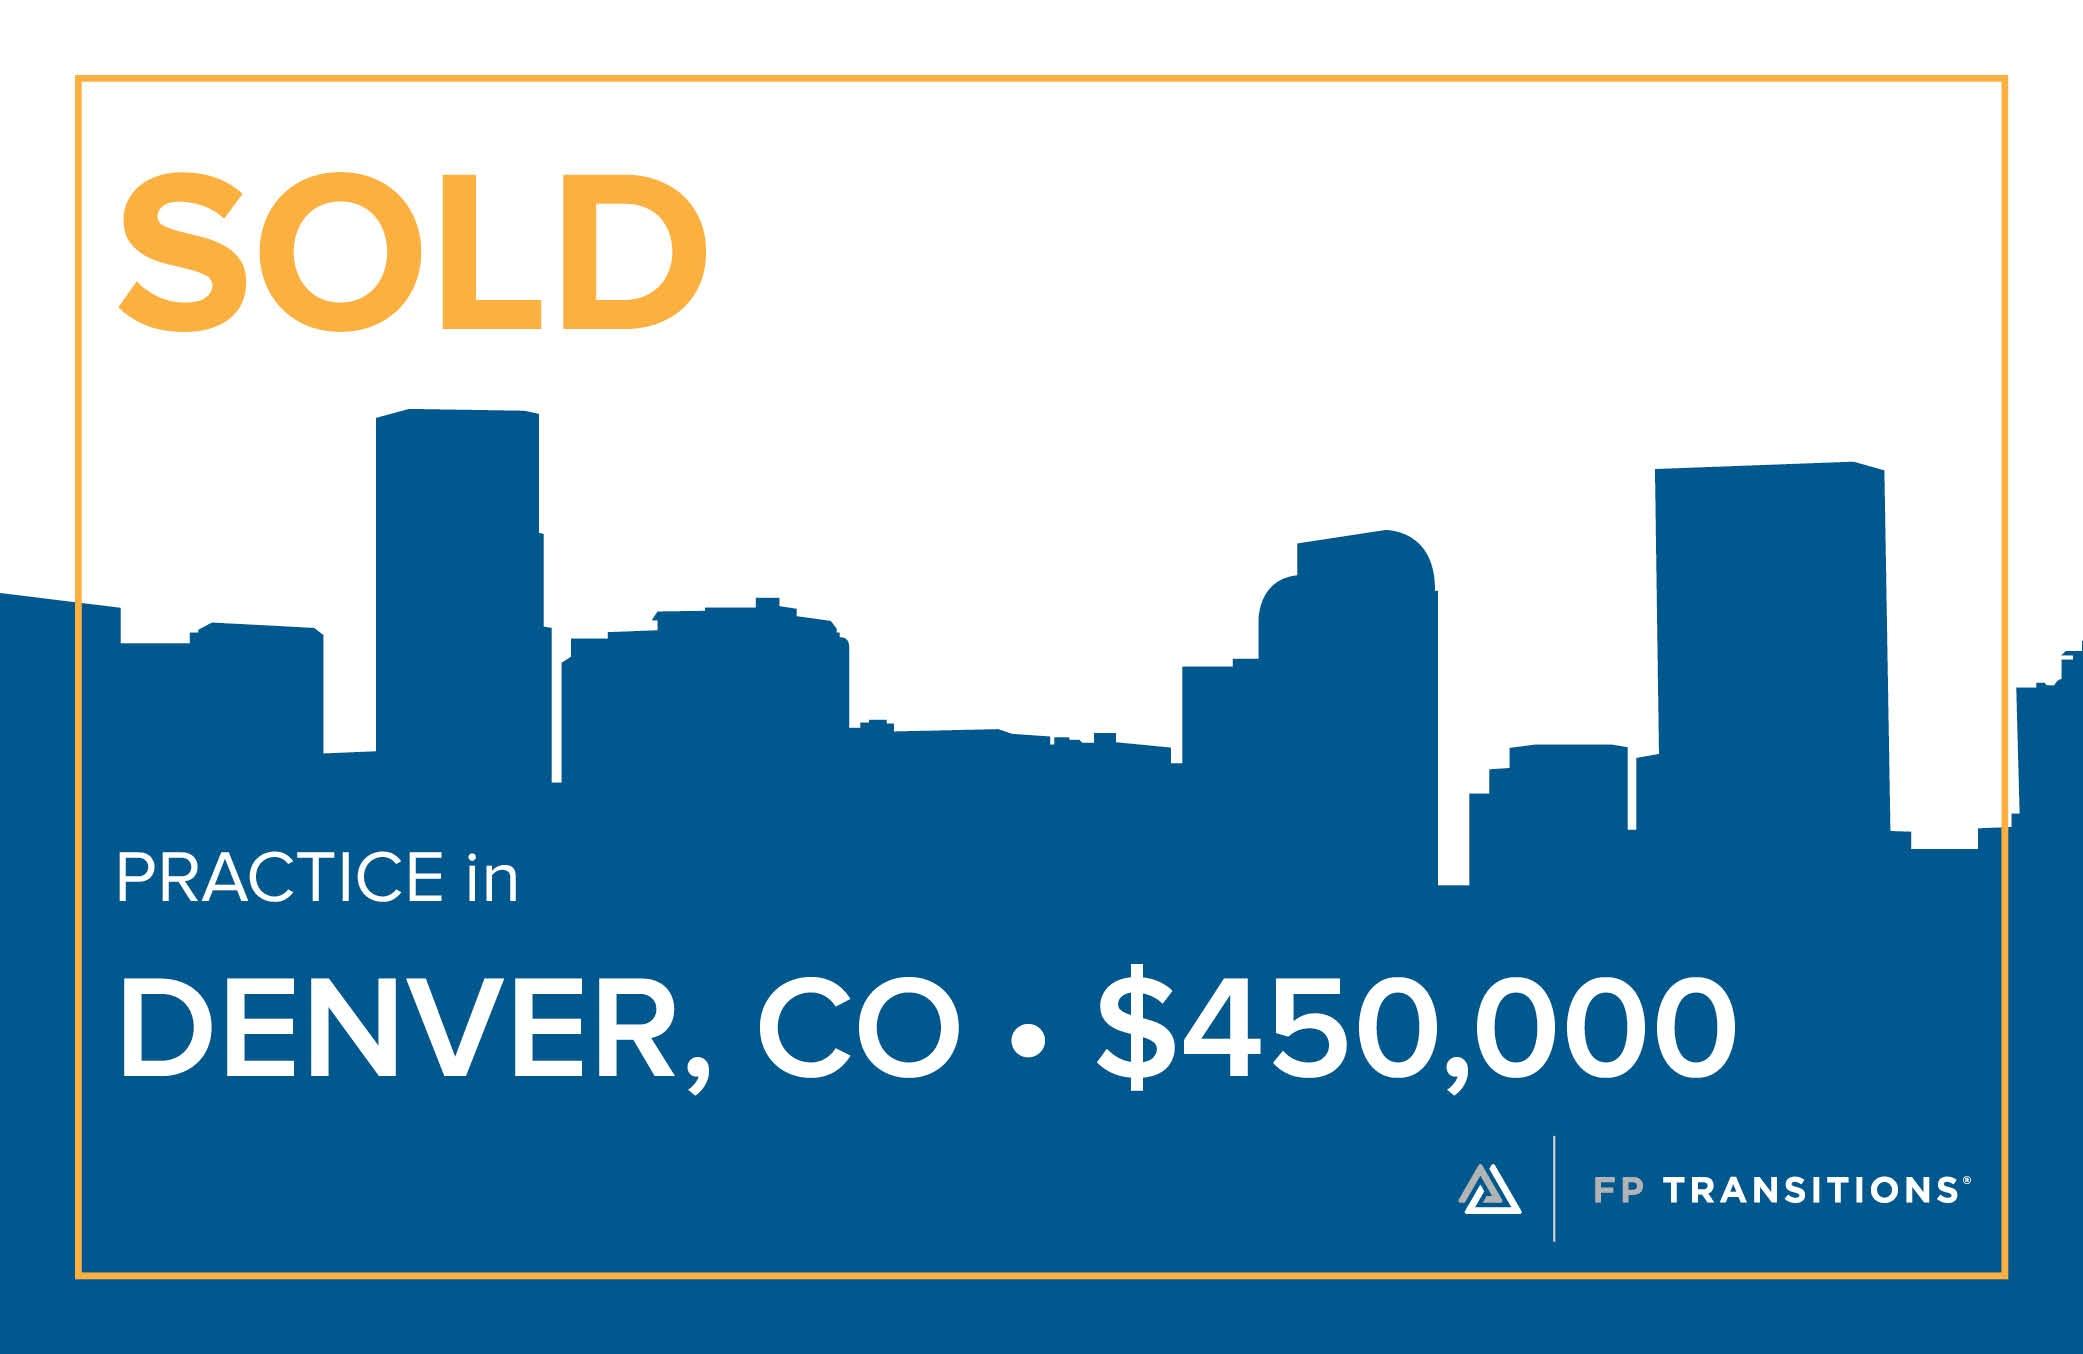 Sold: Practice in Denver CO | $450,000